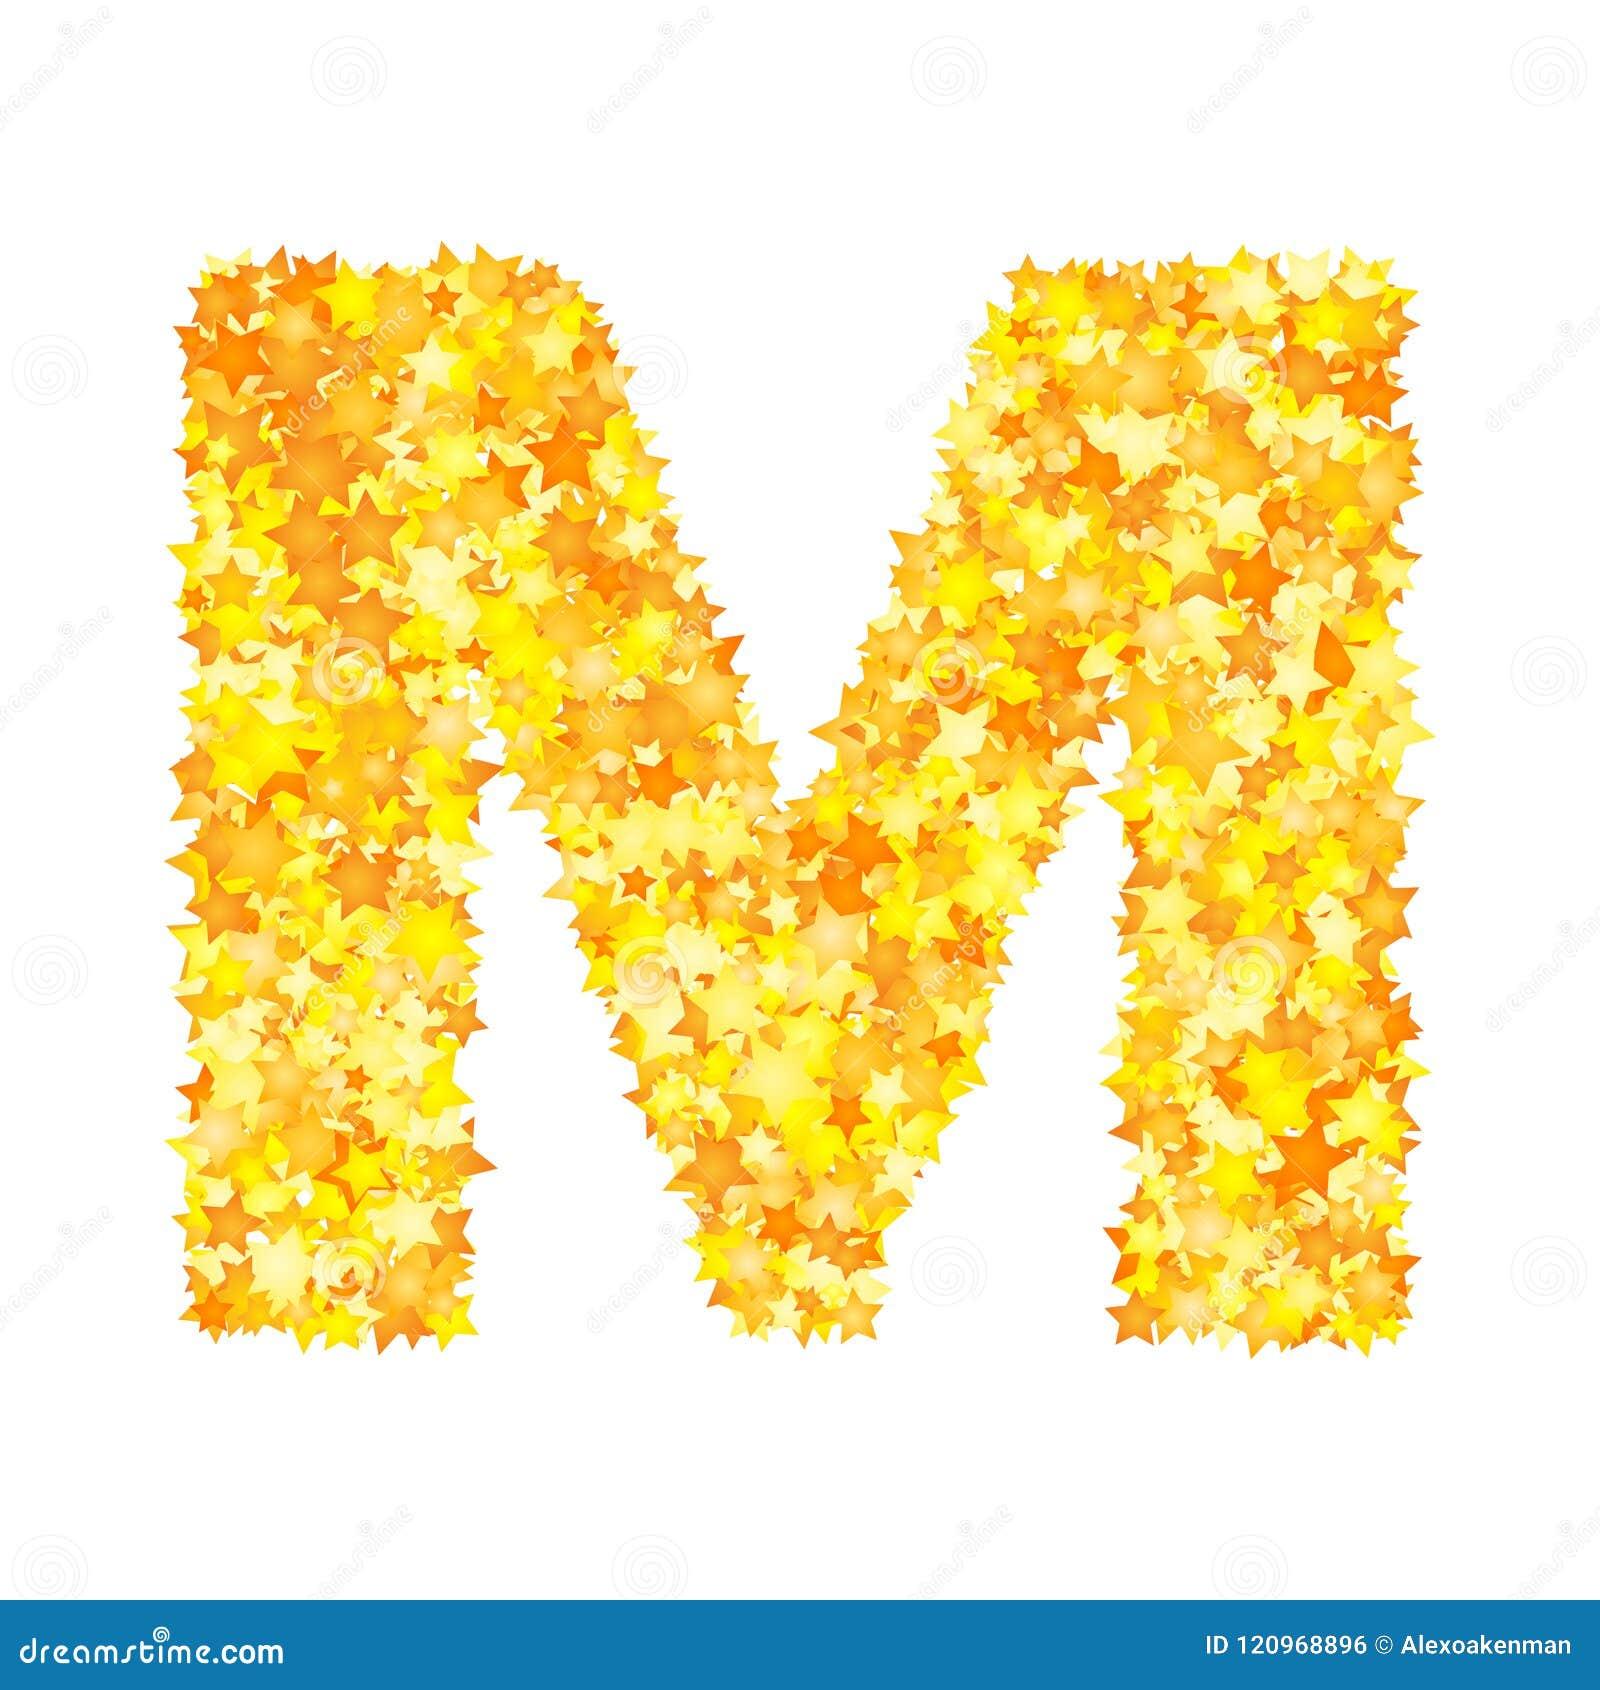 Vector yellow stars font, letter M